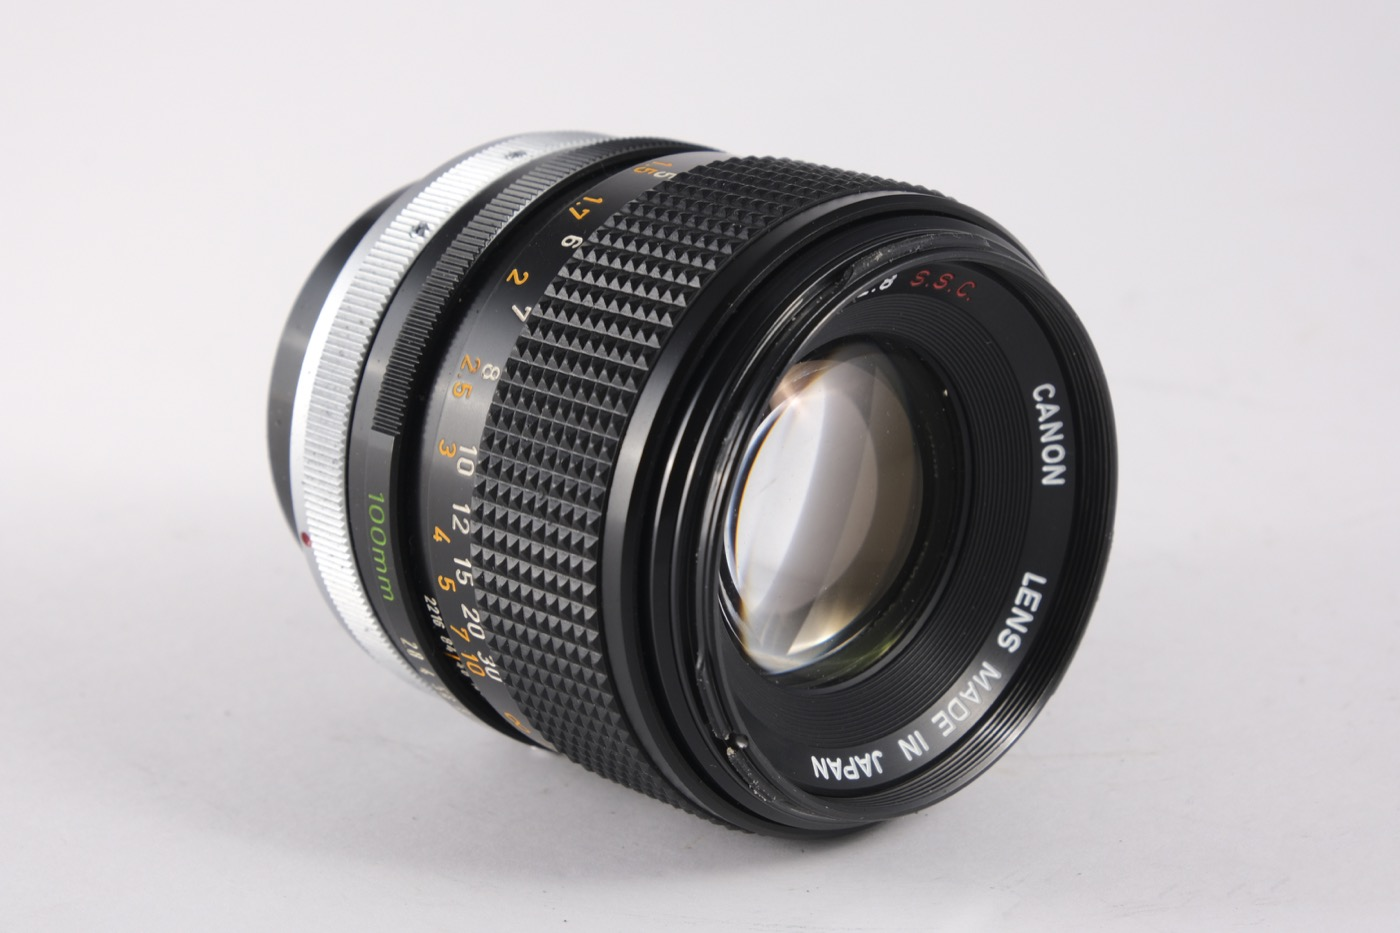 Canon 100mm f/2.8 lens